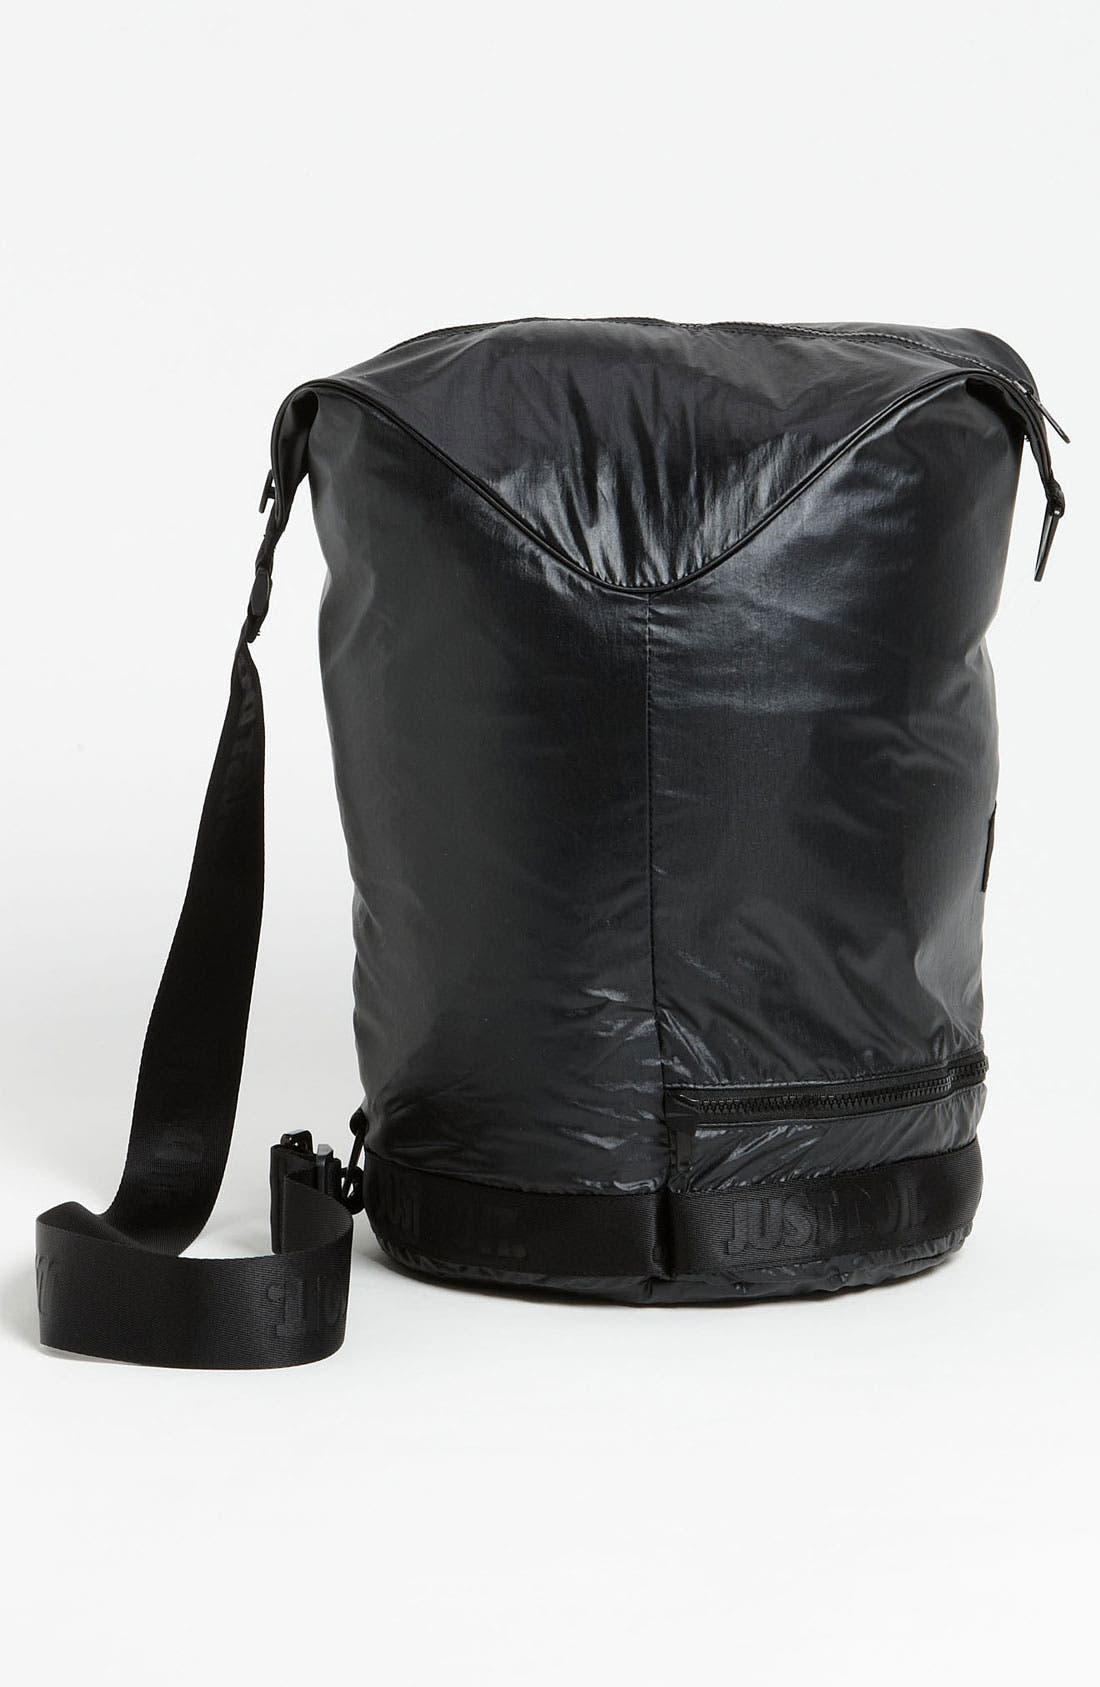 NIKE,                             'Bucket' Sling Bag,                             Alternate thumbnail 2, color,                             030